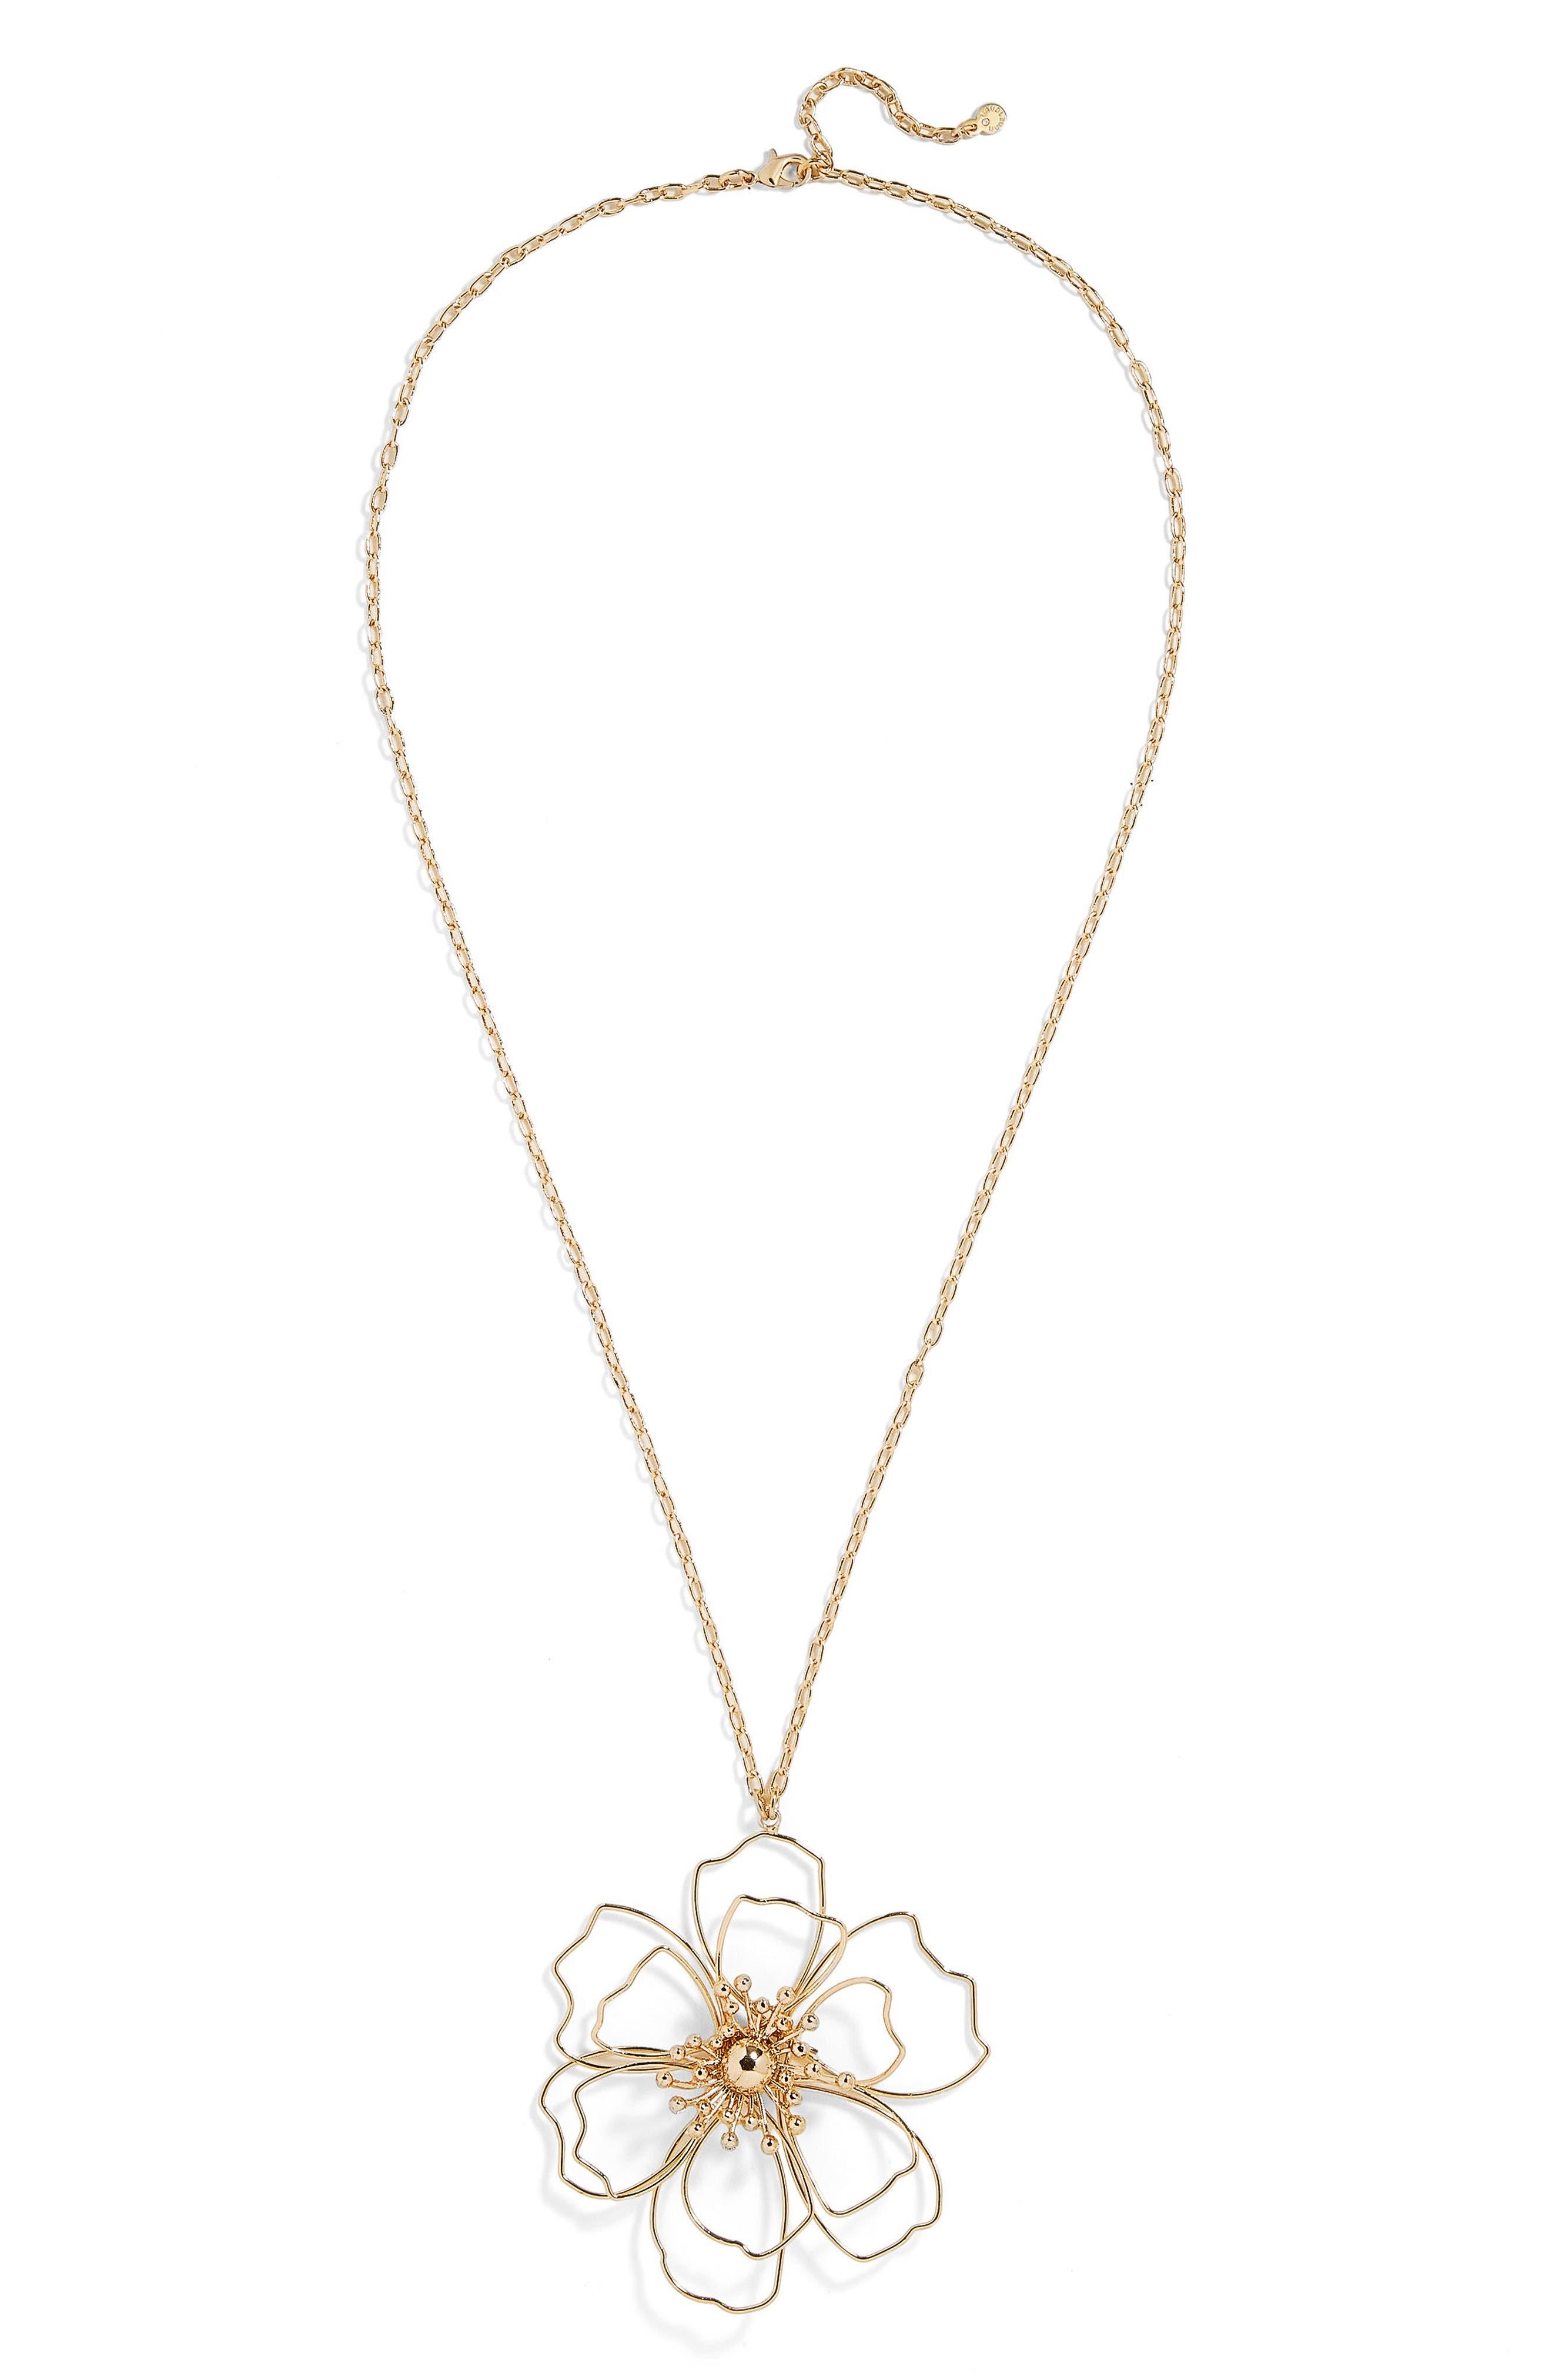 Blossom Pendant Necklace,                             Main thumbnail 1, color,                             710